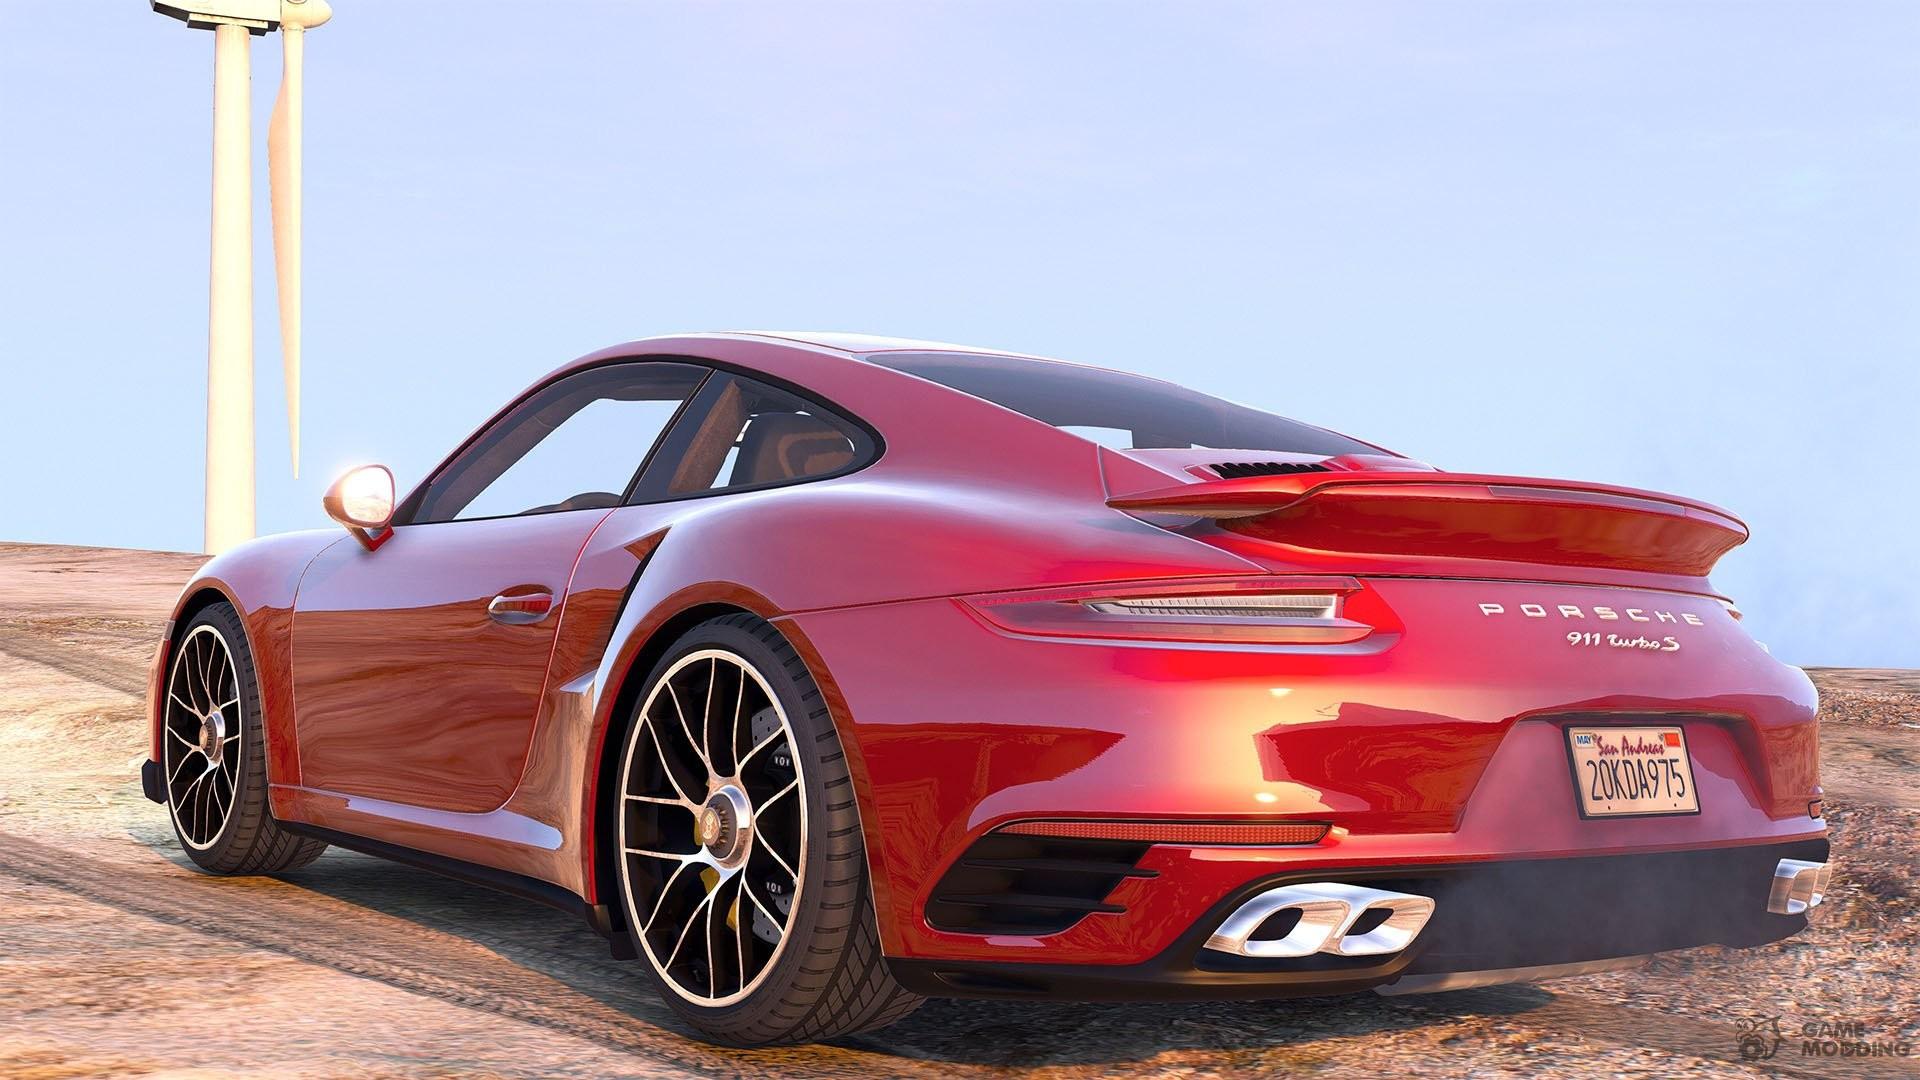 2016 porsche 911 turbo s 1 2 for gta 5. Black Bedroom Furniture Sets. Home Design Ideas